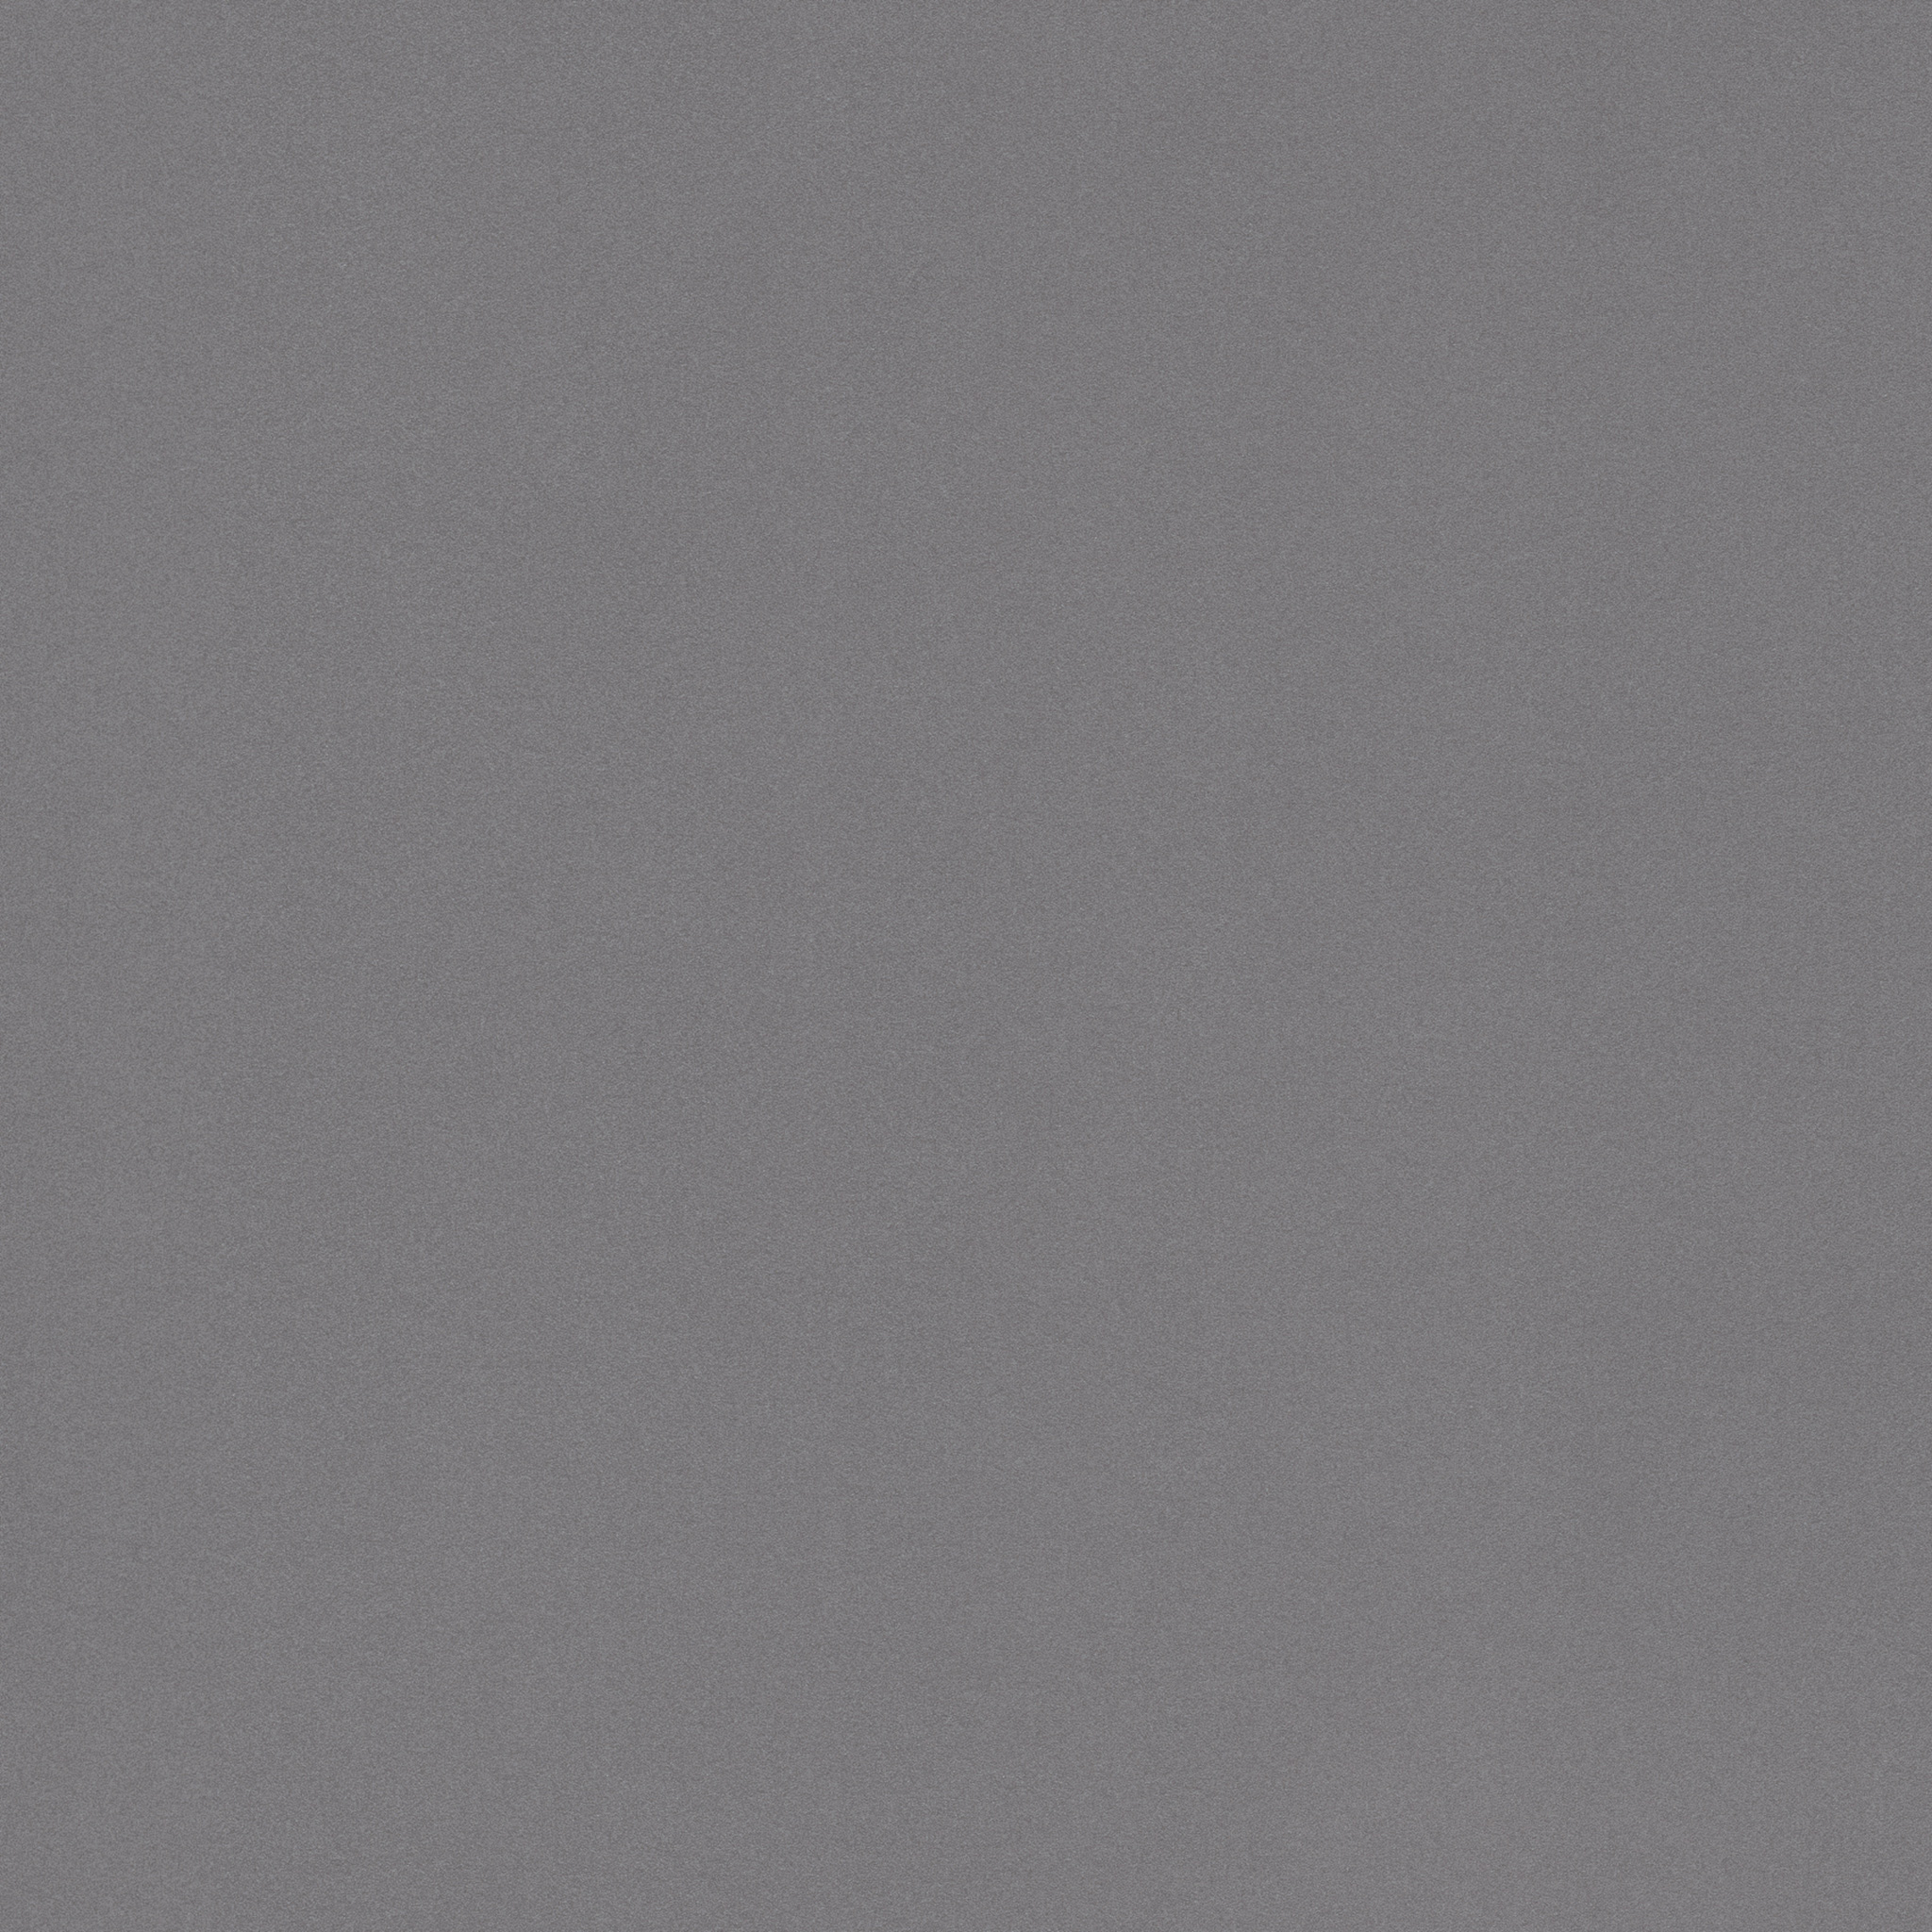 F477 ST9 Metalic blauwgrijs  Image